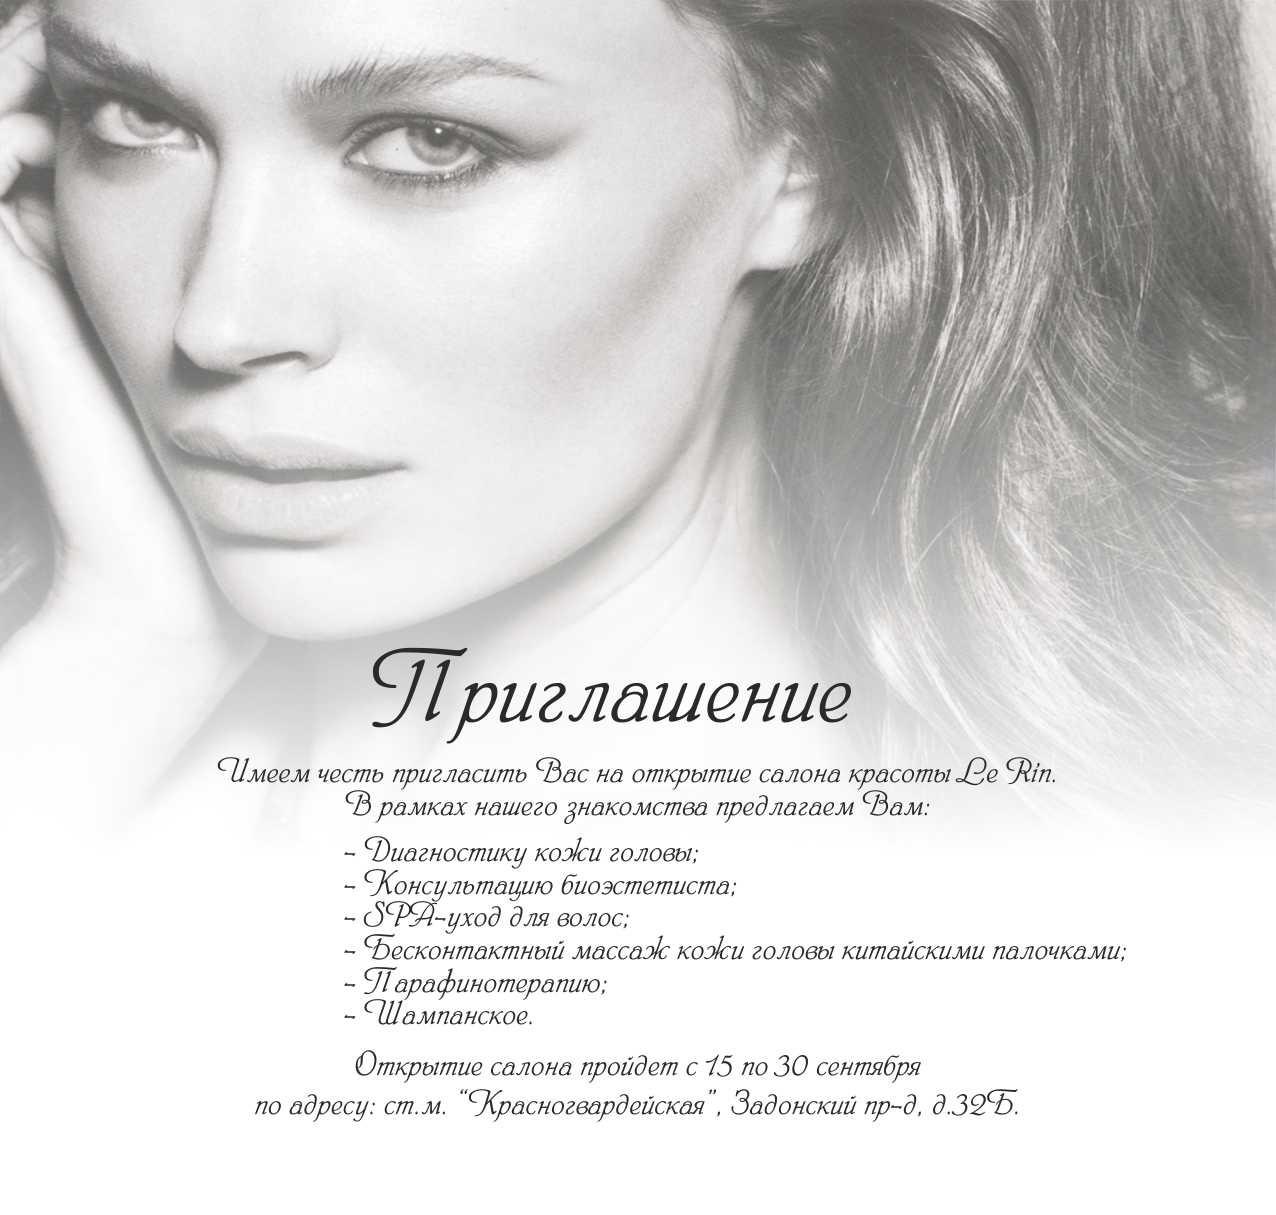 Дизайн приглашения на открытие салона ...: www.raeverest.ru/invitation-design.php